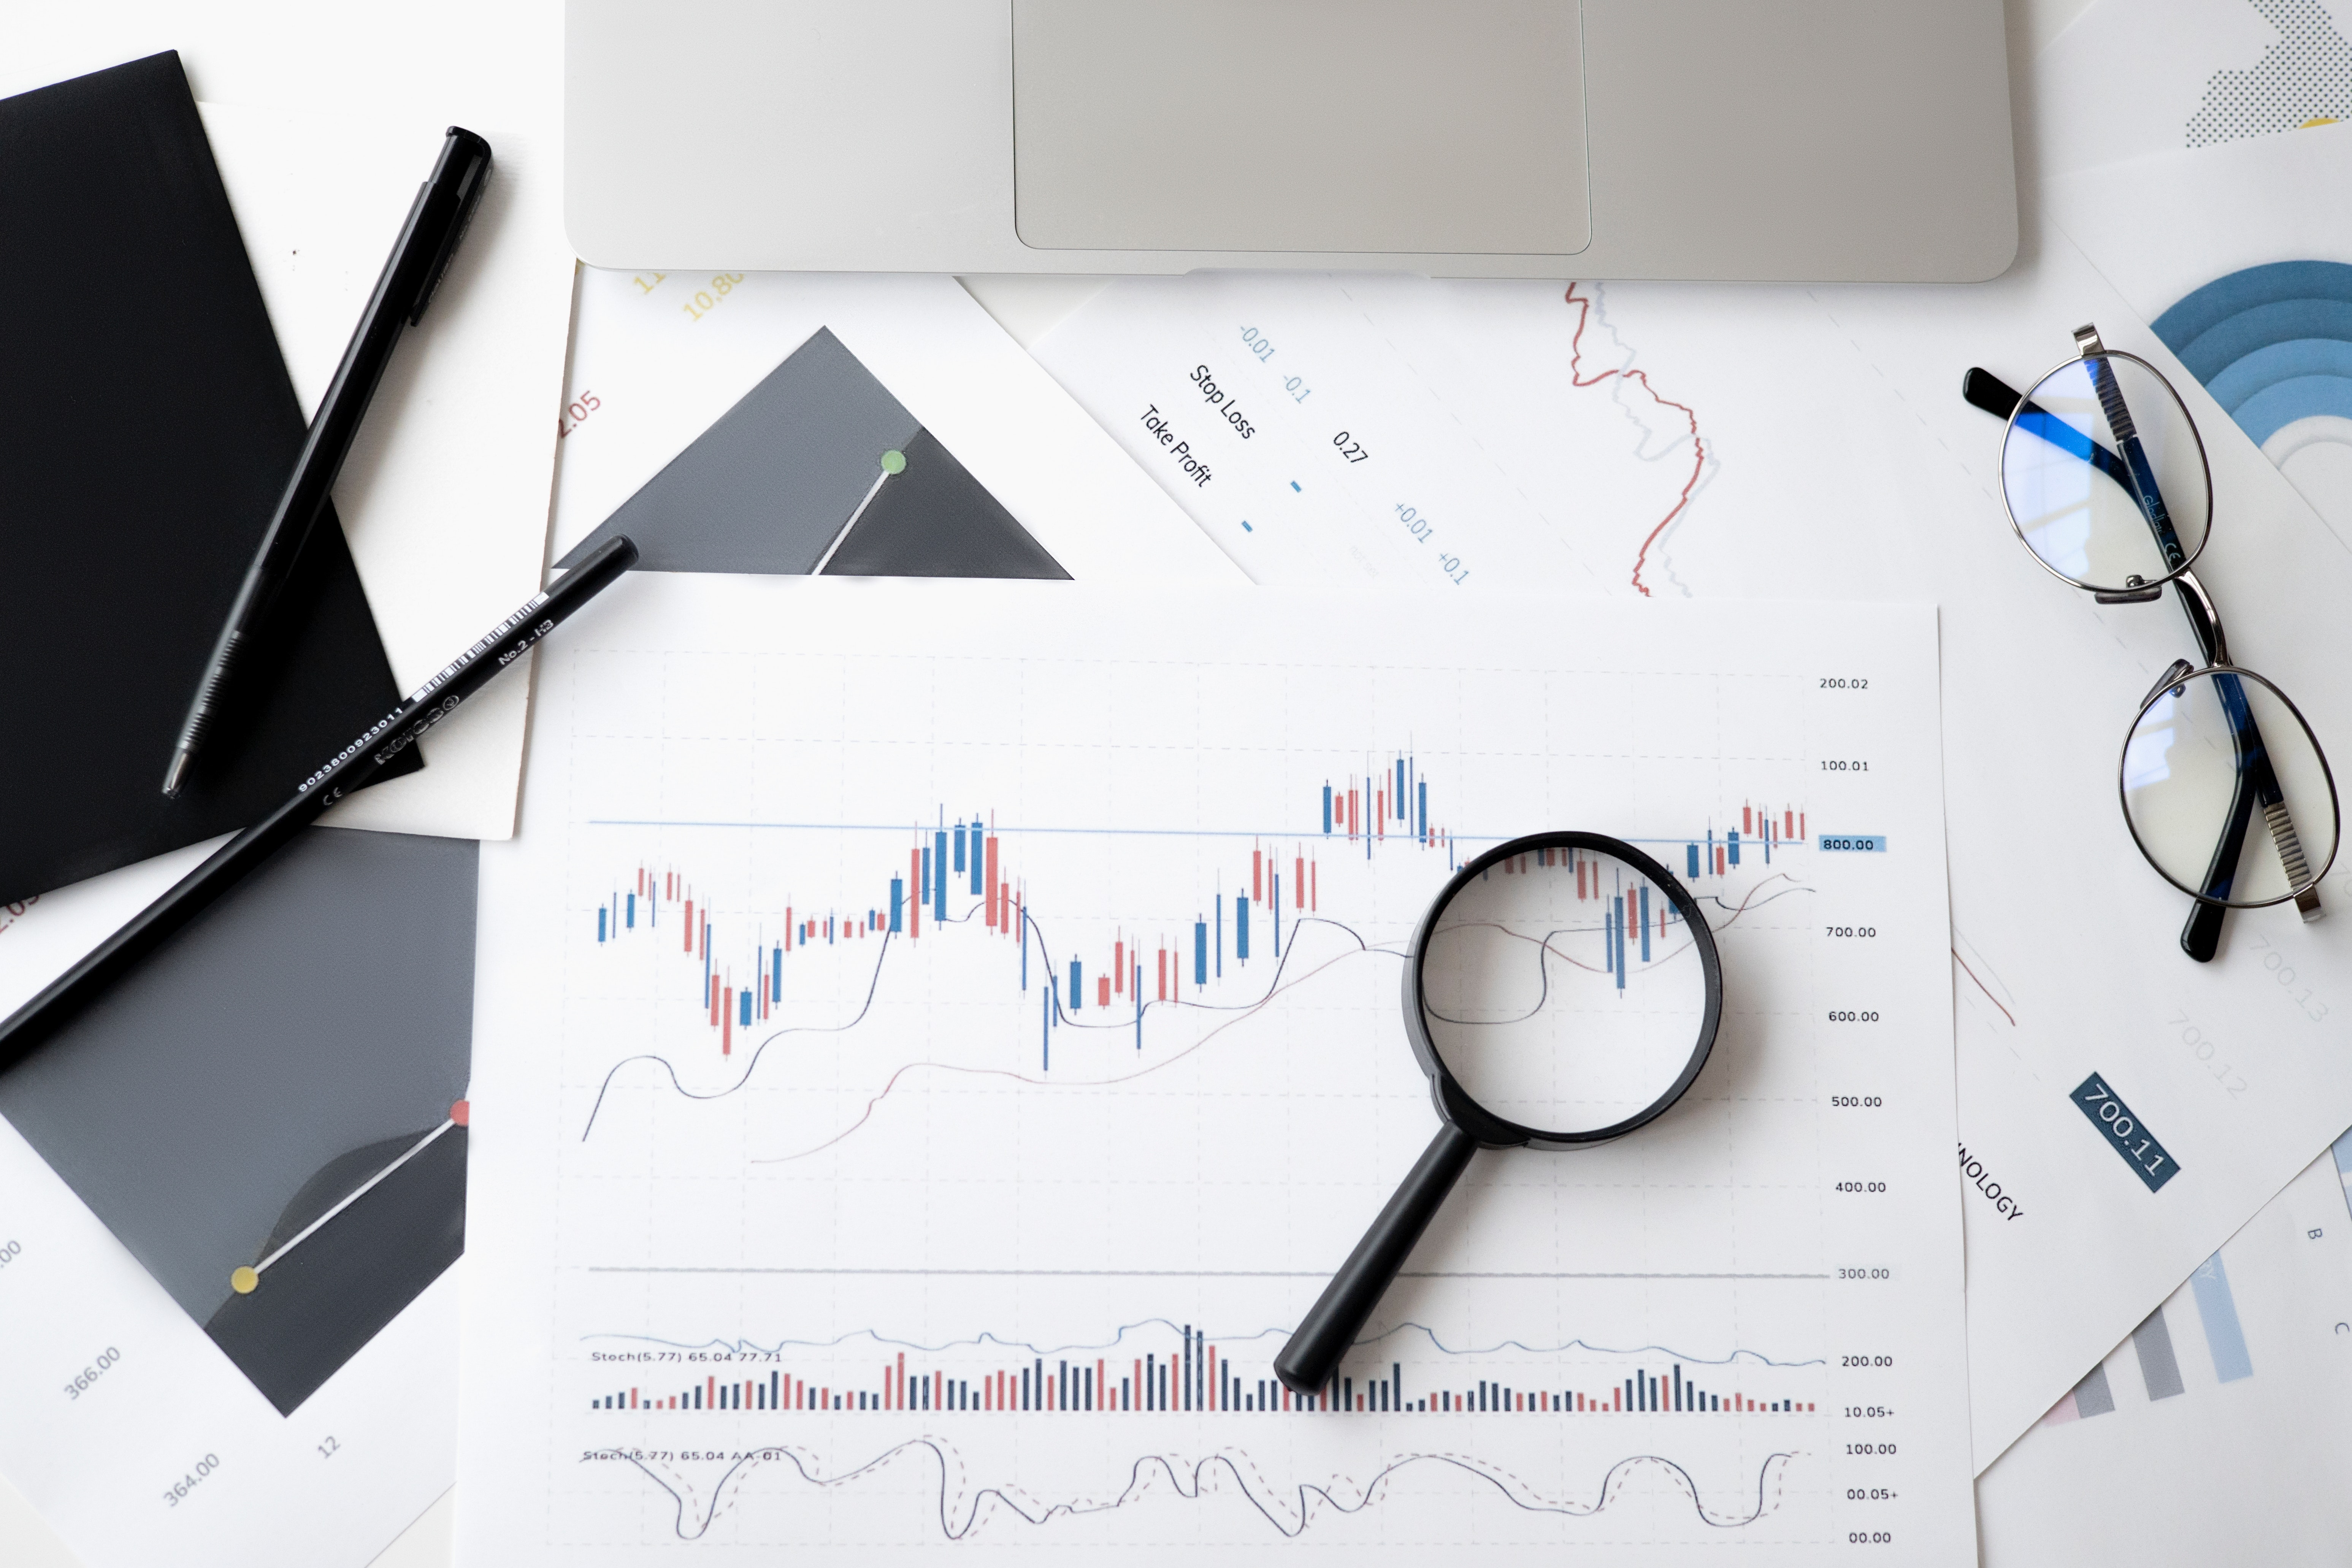 2021-06-15-8-metrics-that-drive-revenue-growth-in-estimating